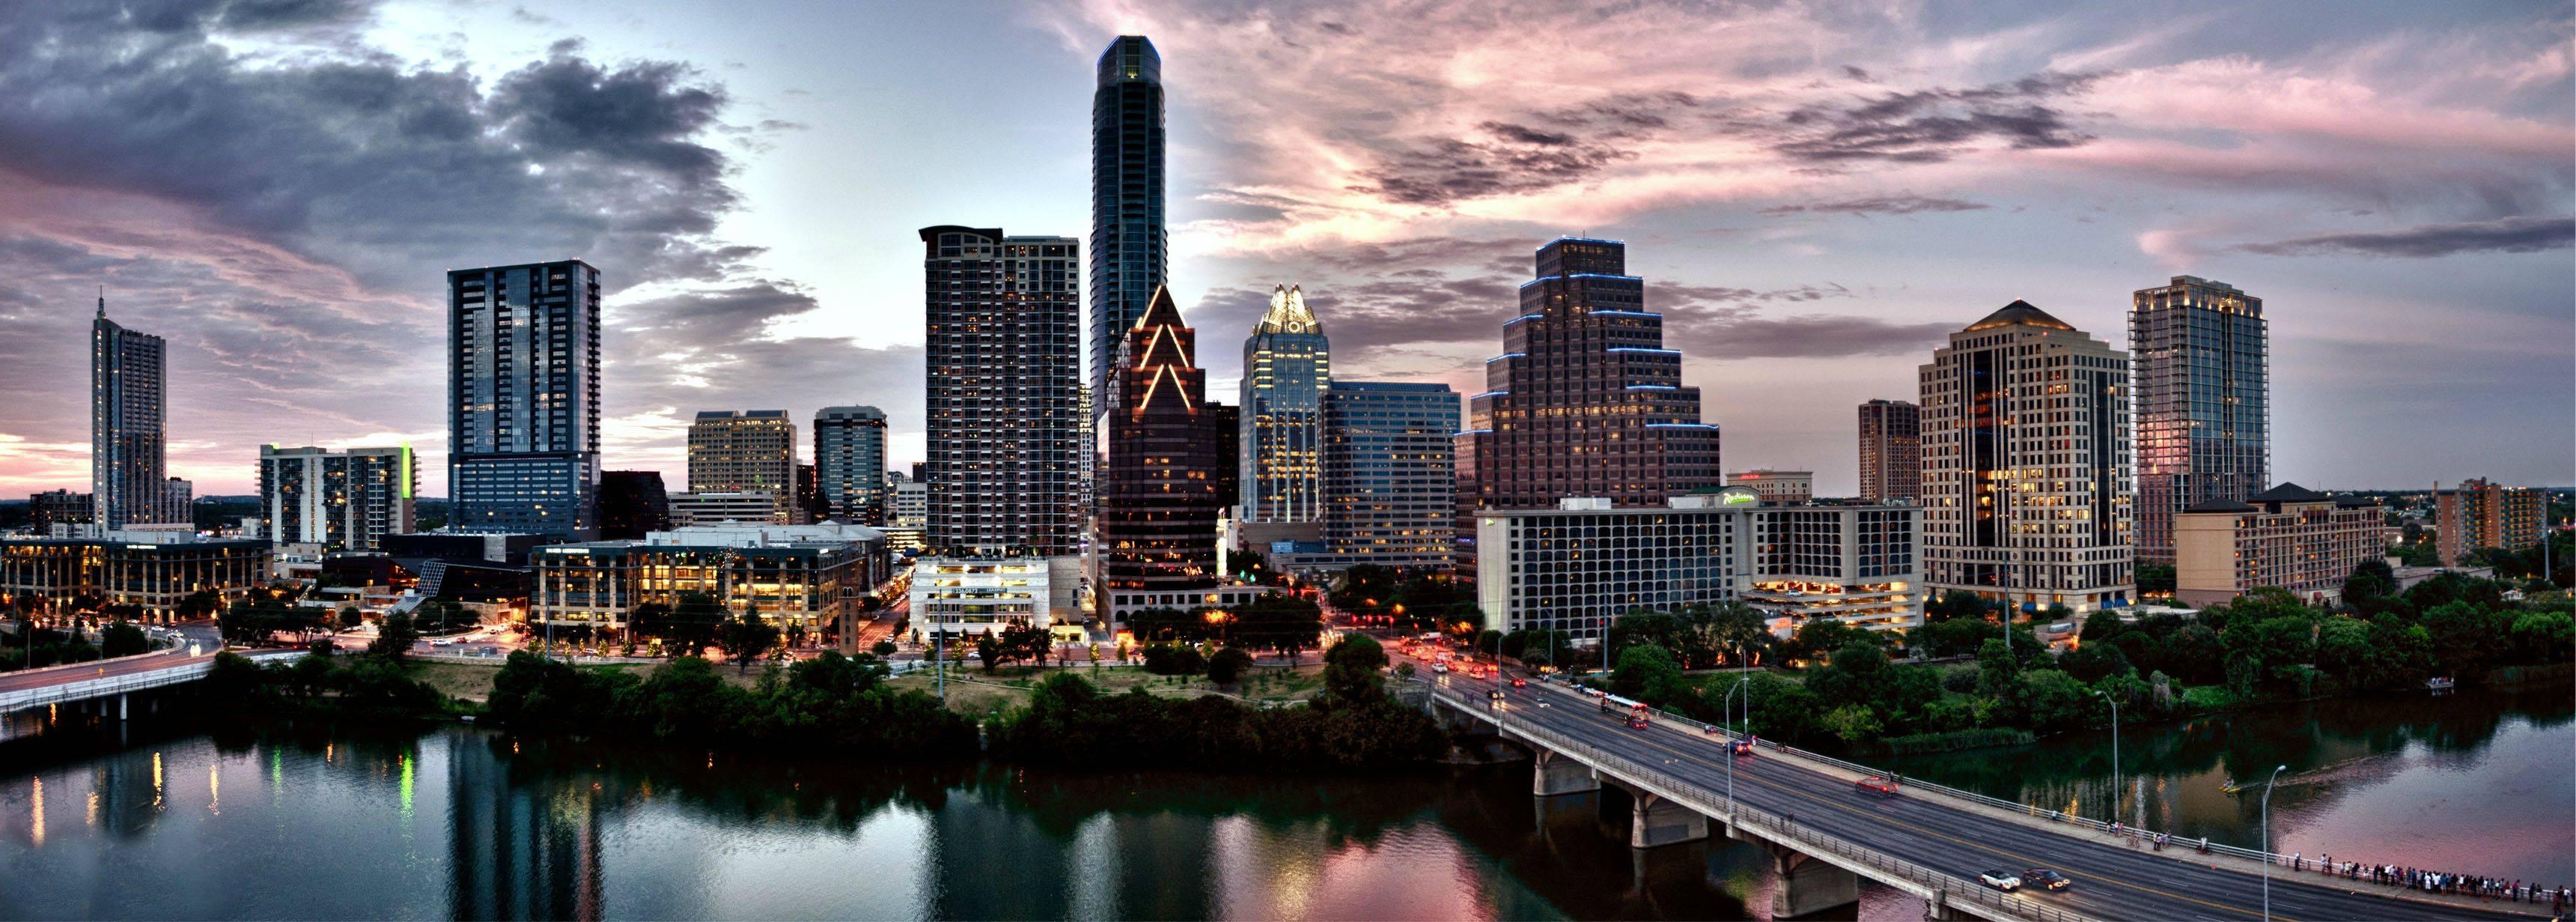 Community Highlight: Downtown Austin, Texas